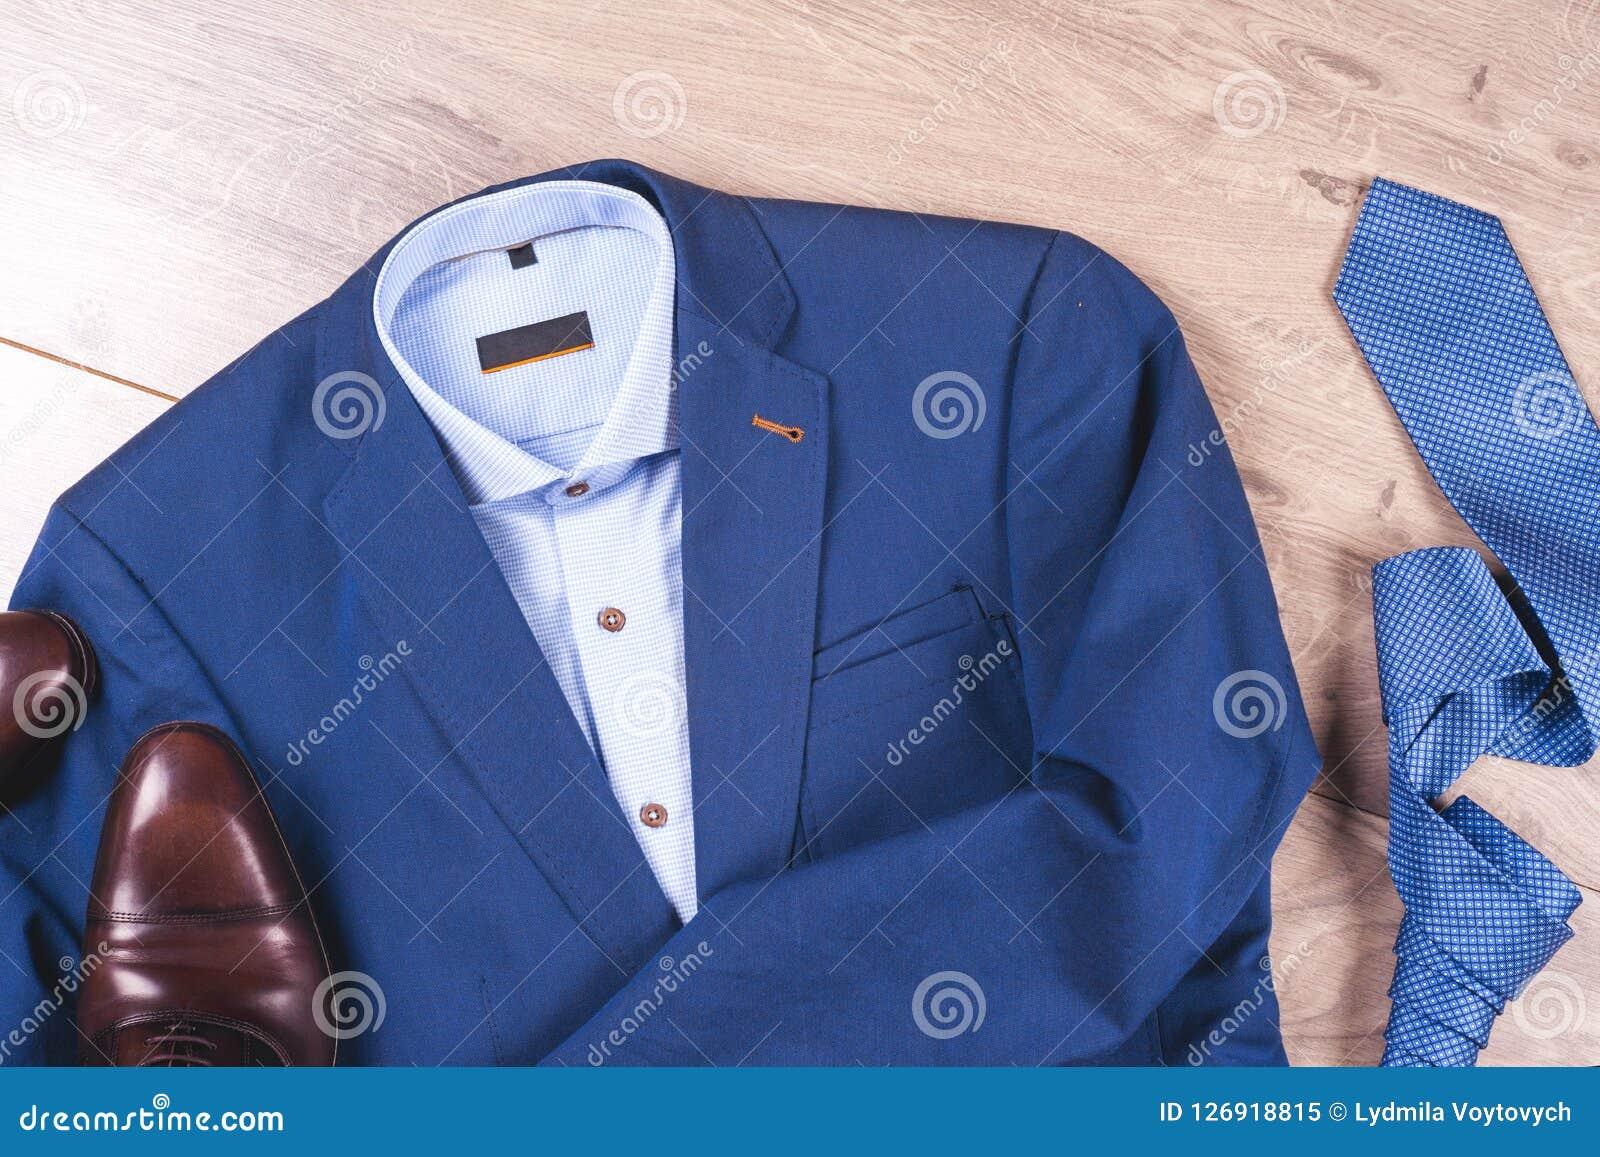 80f818378a2ed Sistema De La Ropa Para Hombre Clásica - Traje Azul